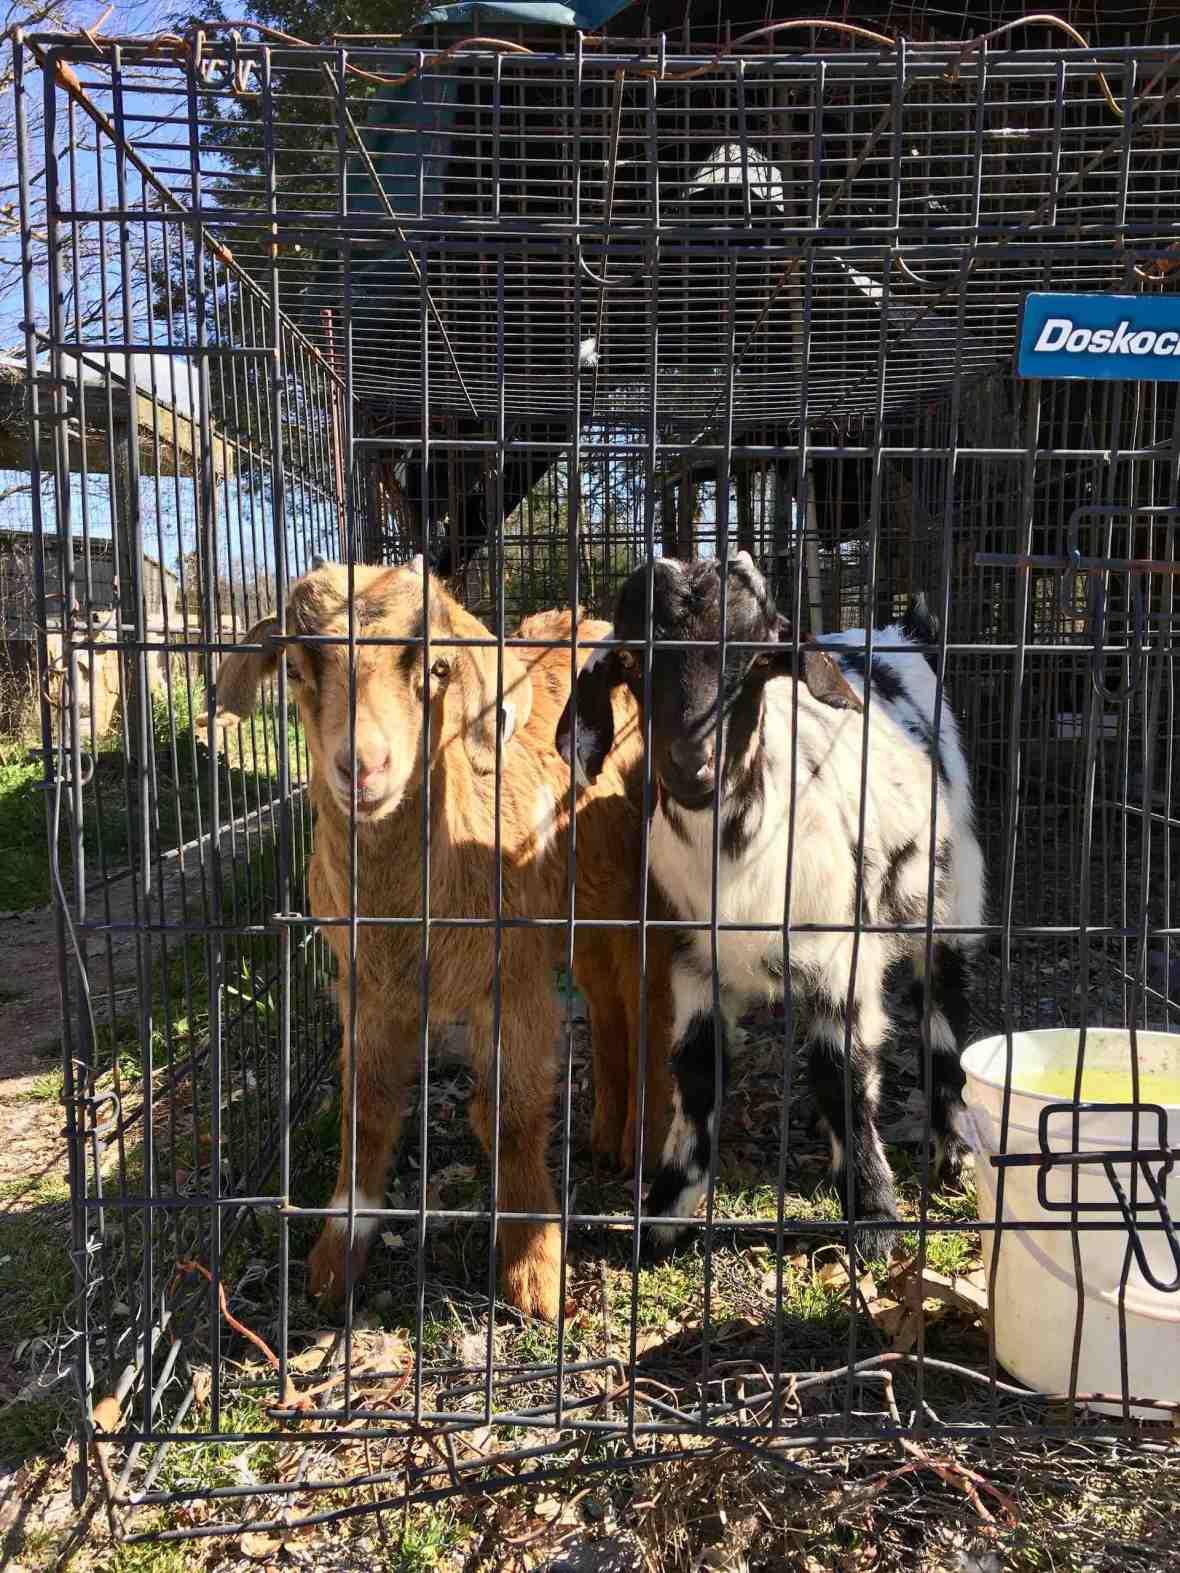 Caged Goats at Lebanon area flea market